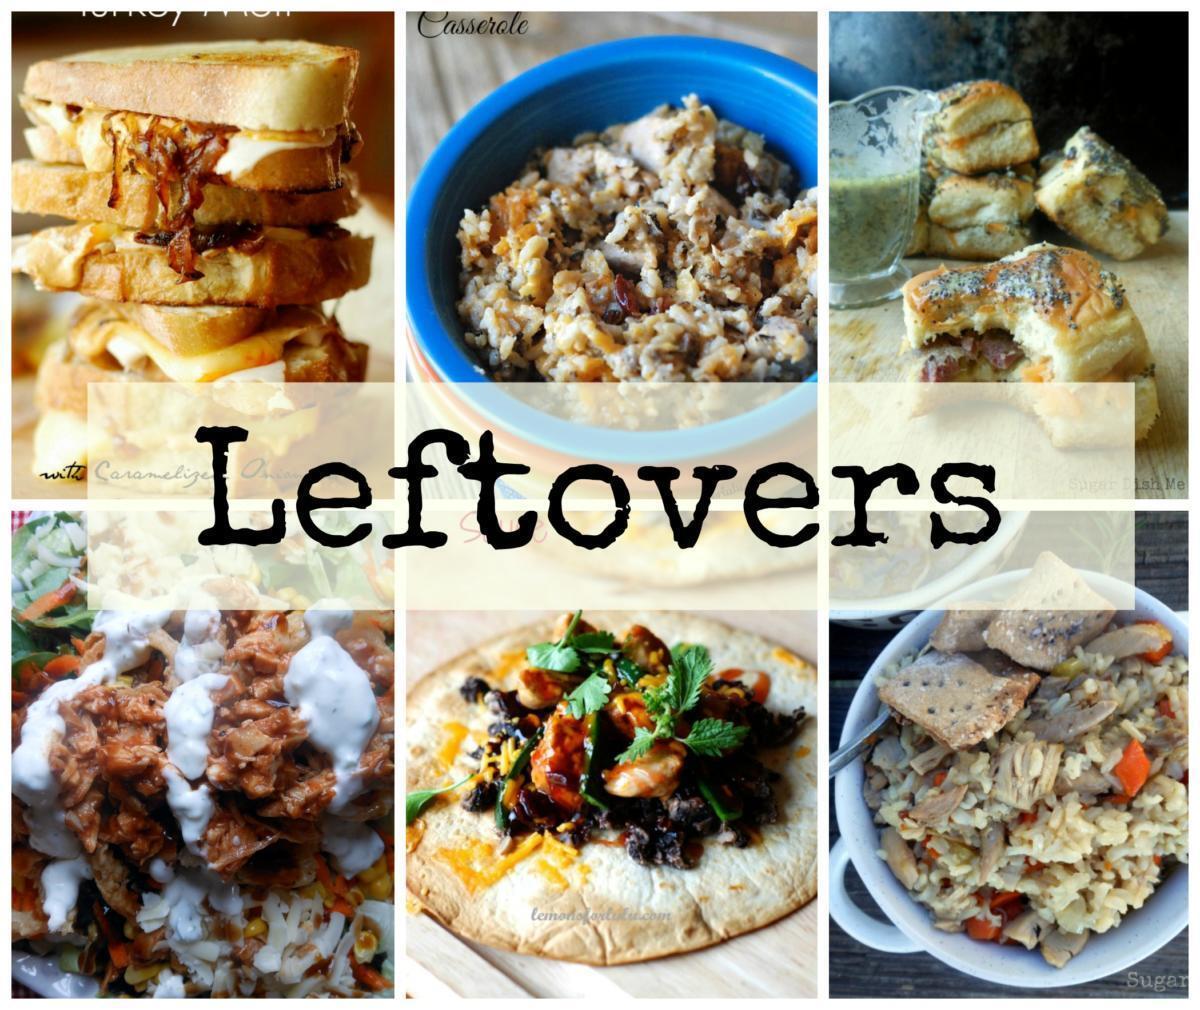 leftoverss